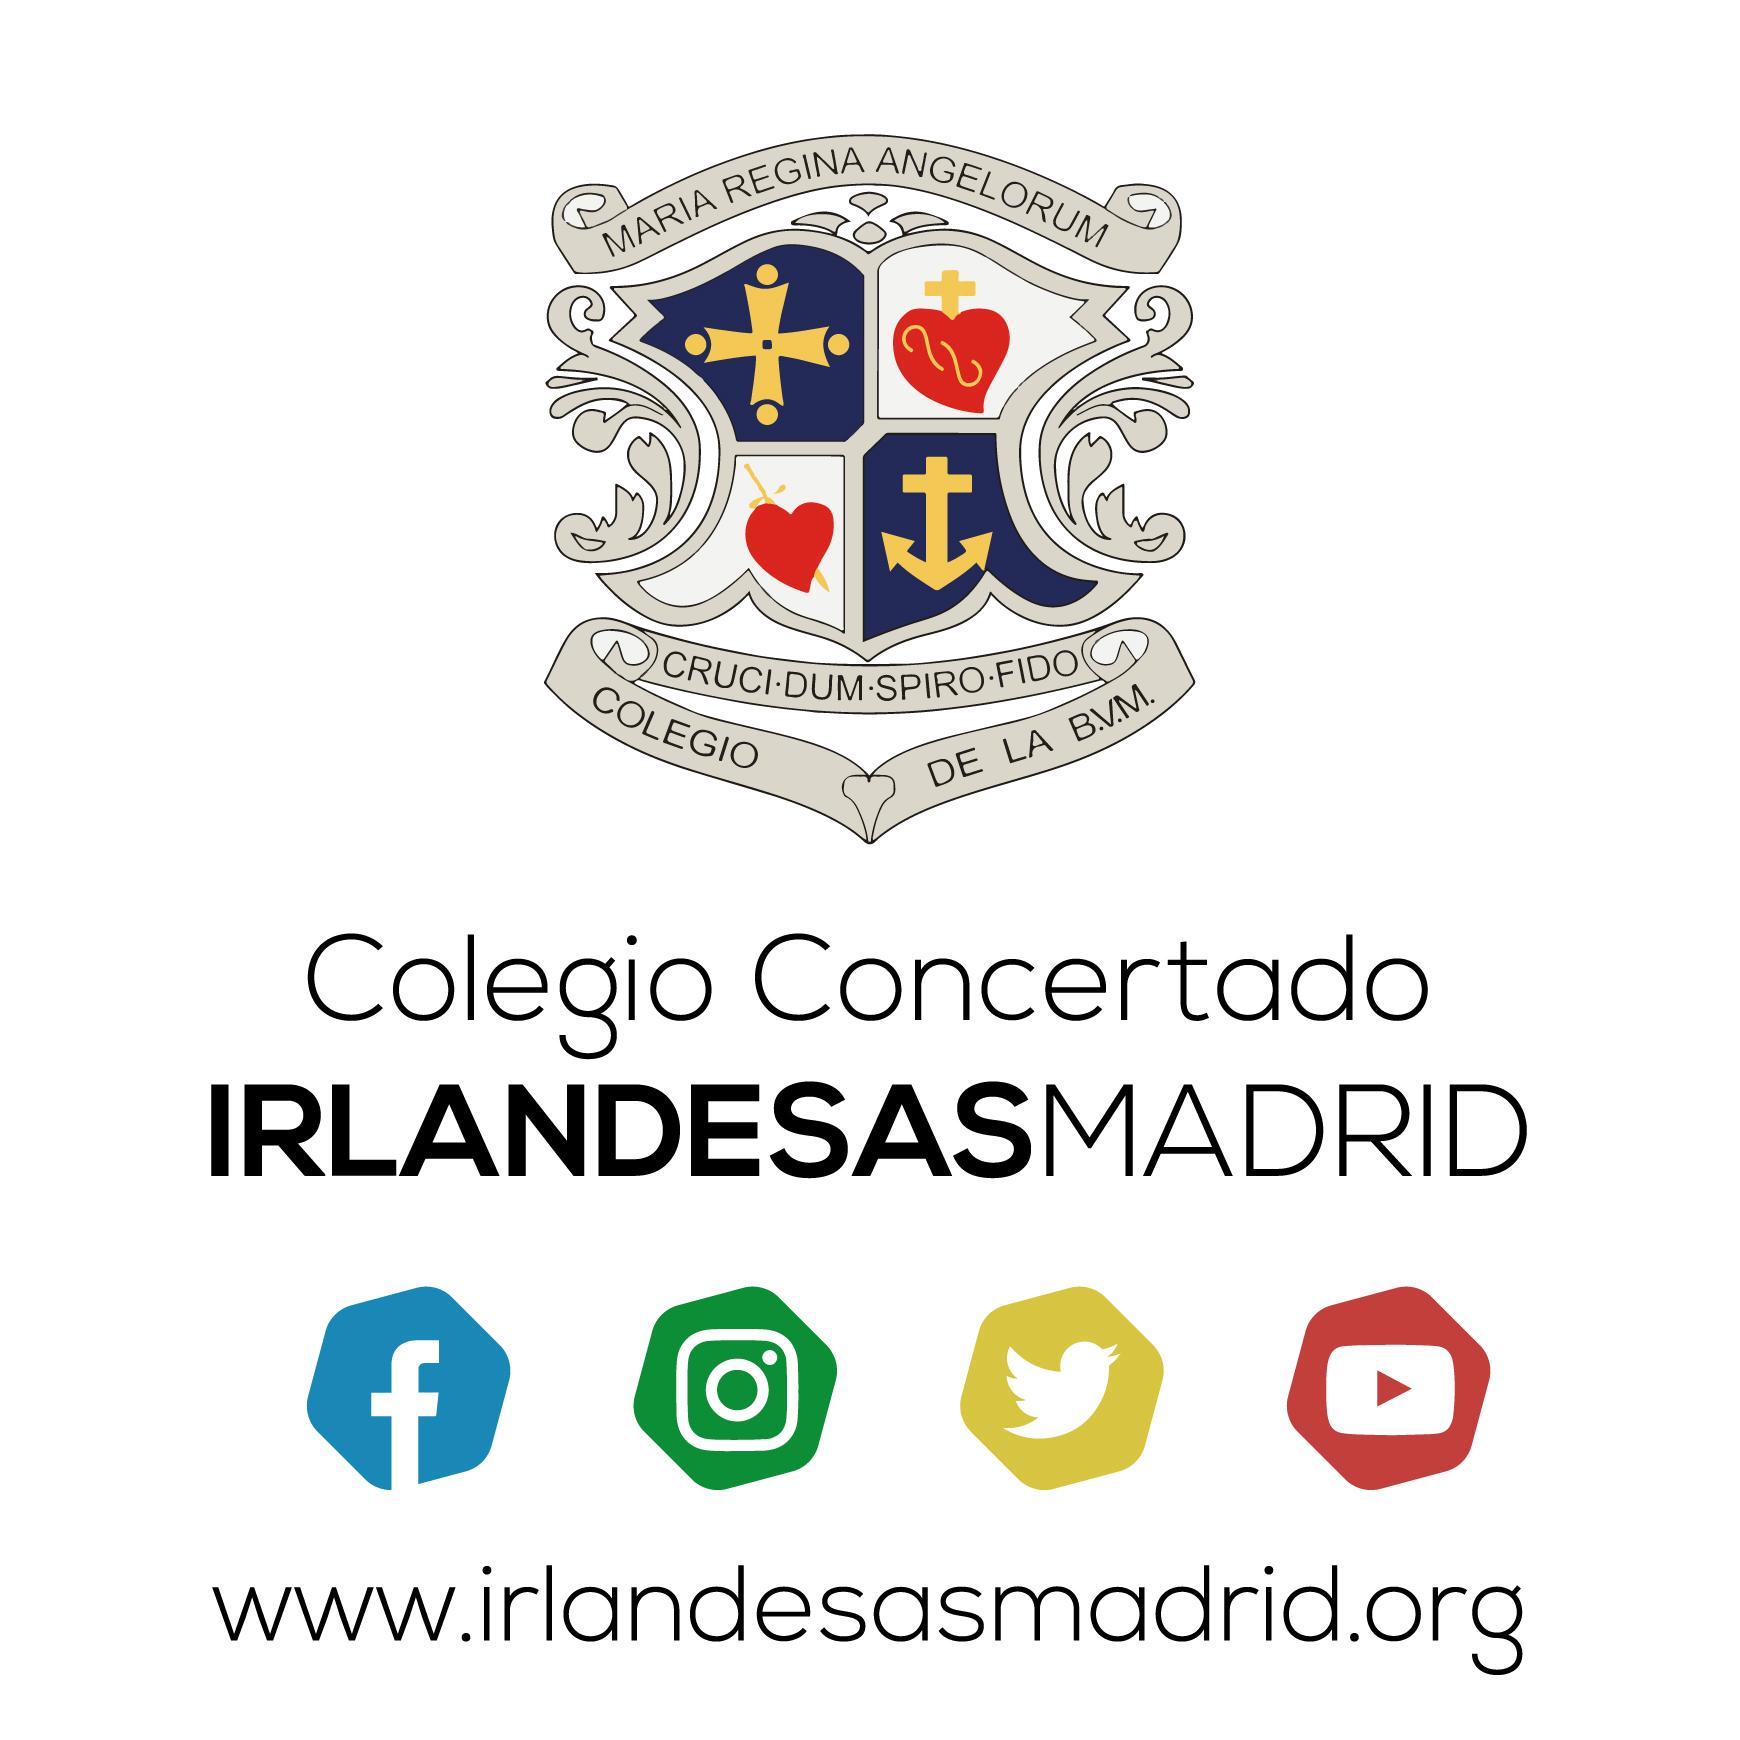 Logo Irlandesas Madrid (BVM)